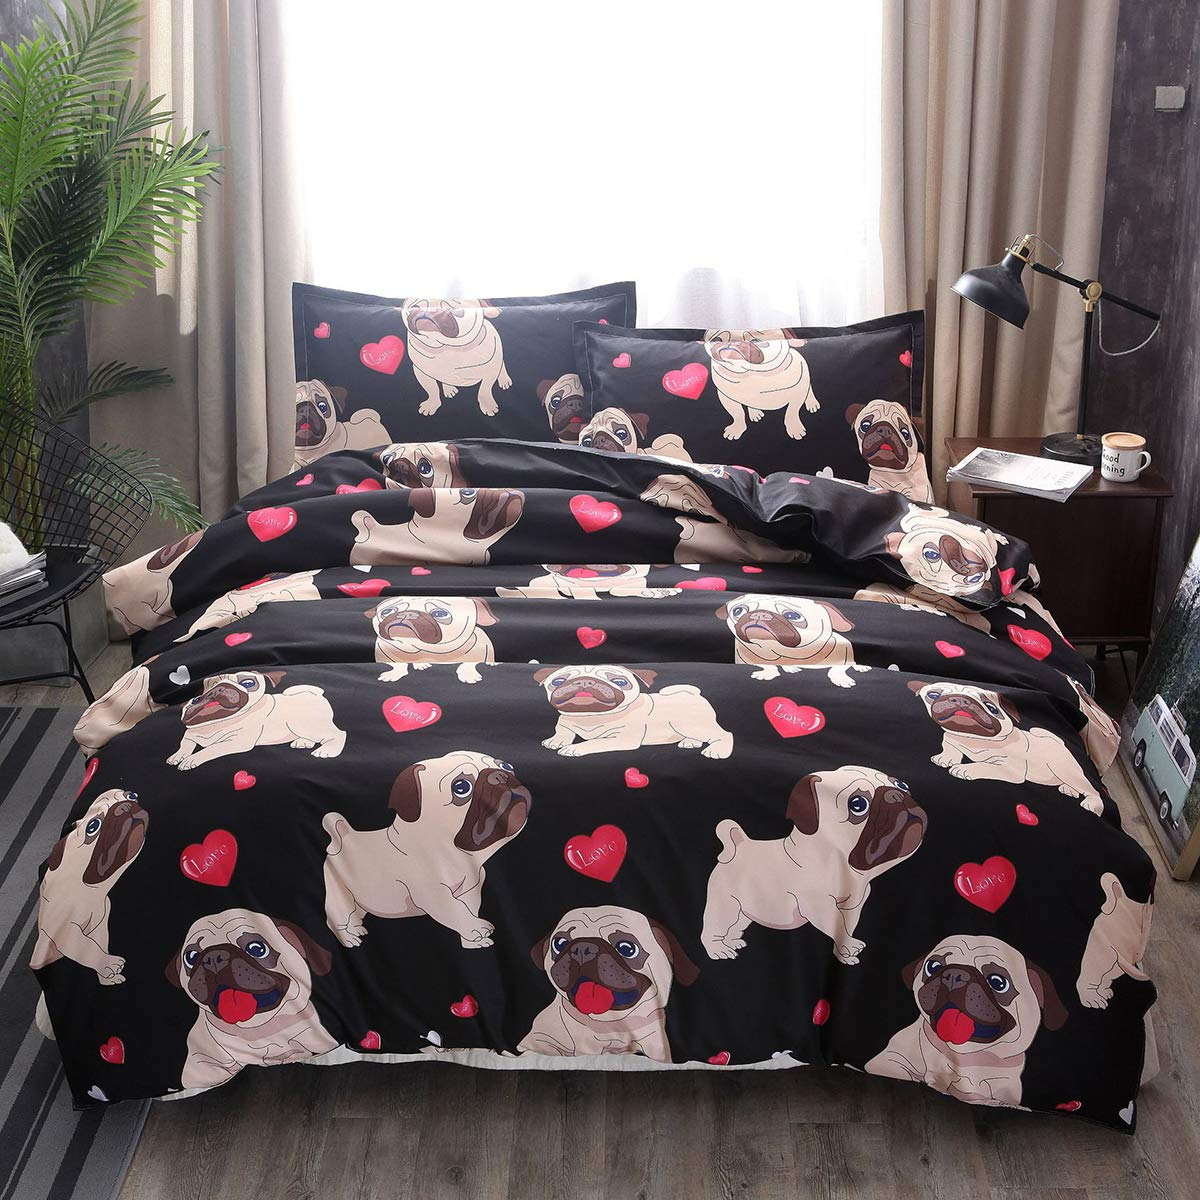 Koongso Pug Duvet Cover Cartoon Cute Pug Love Hearts Beddings 3D Boys Girls Pretty Duvet Cover Sets with 2 Pillow Shams